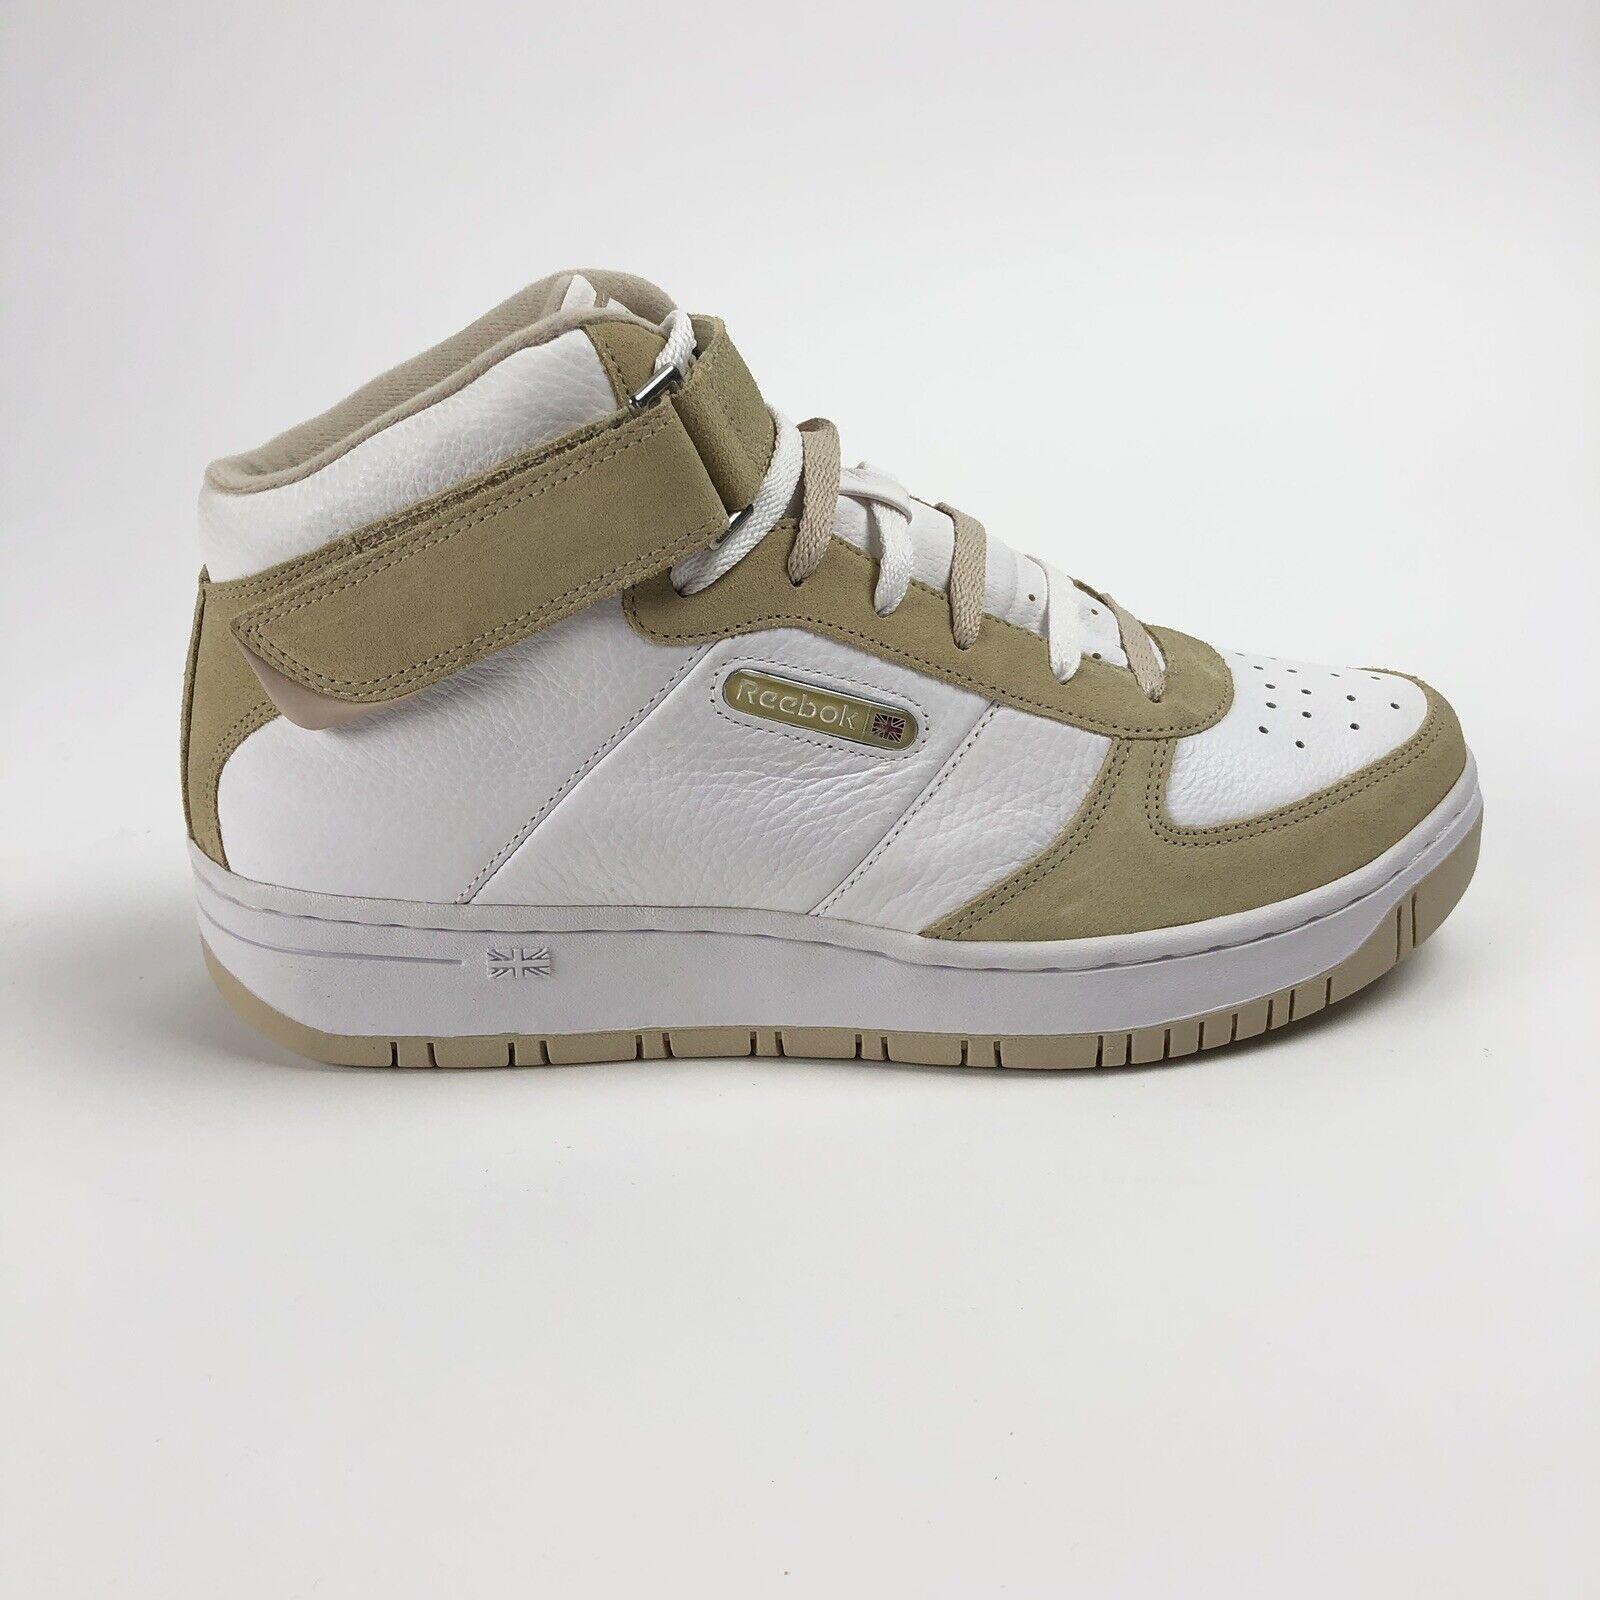 Reebok Classic Amaze Mid Strap Mens 9 Taupe White shoes Retro Sneakers 4-93825